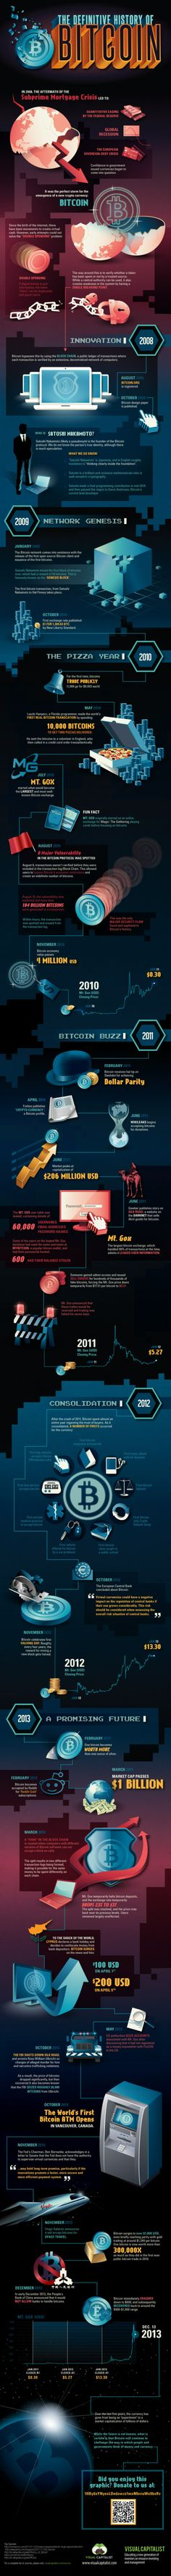 The Definitive History of Bitcoin #bitcoin